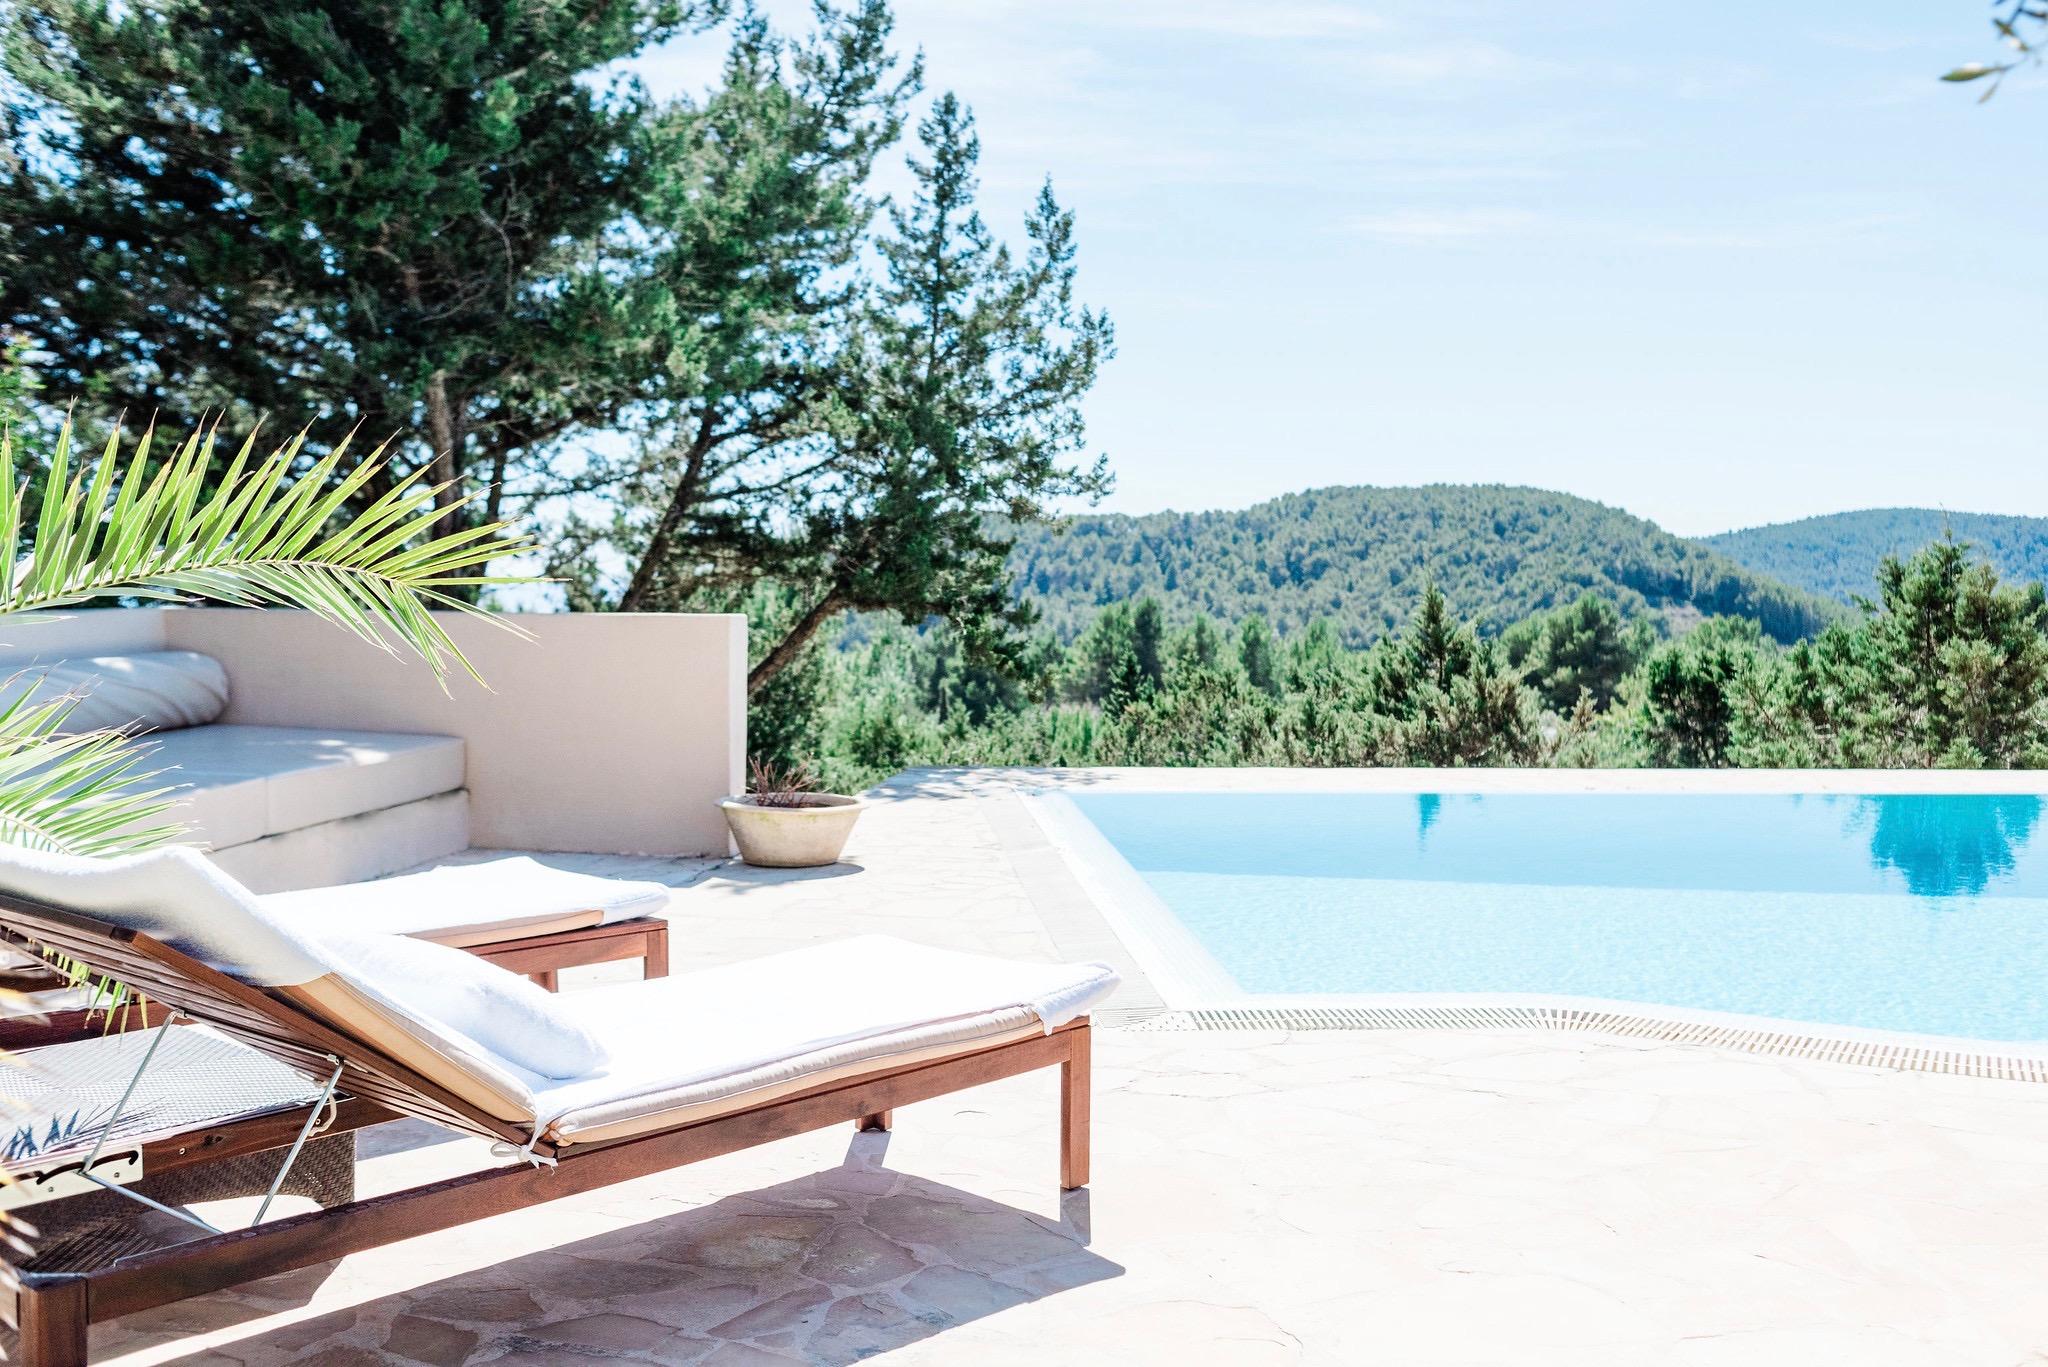 https://www.white-ibiza.com/wp-content/uploads/2020/06/white-ibiza-villas-villa-andrea-exterior-lounger-view2.jpg